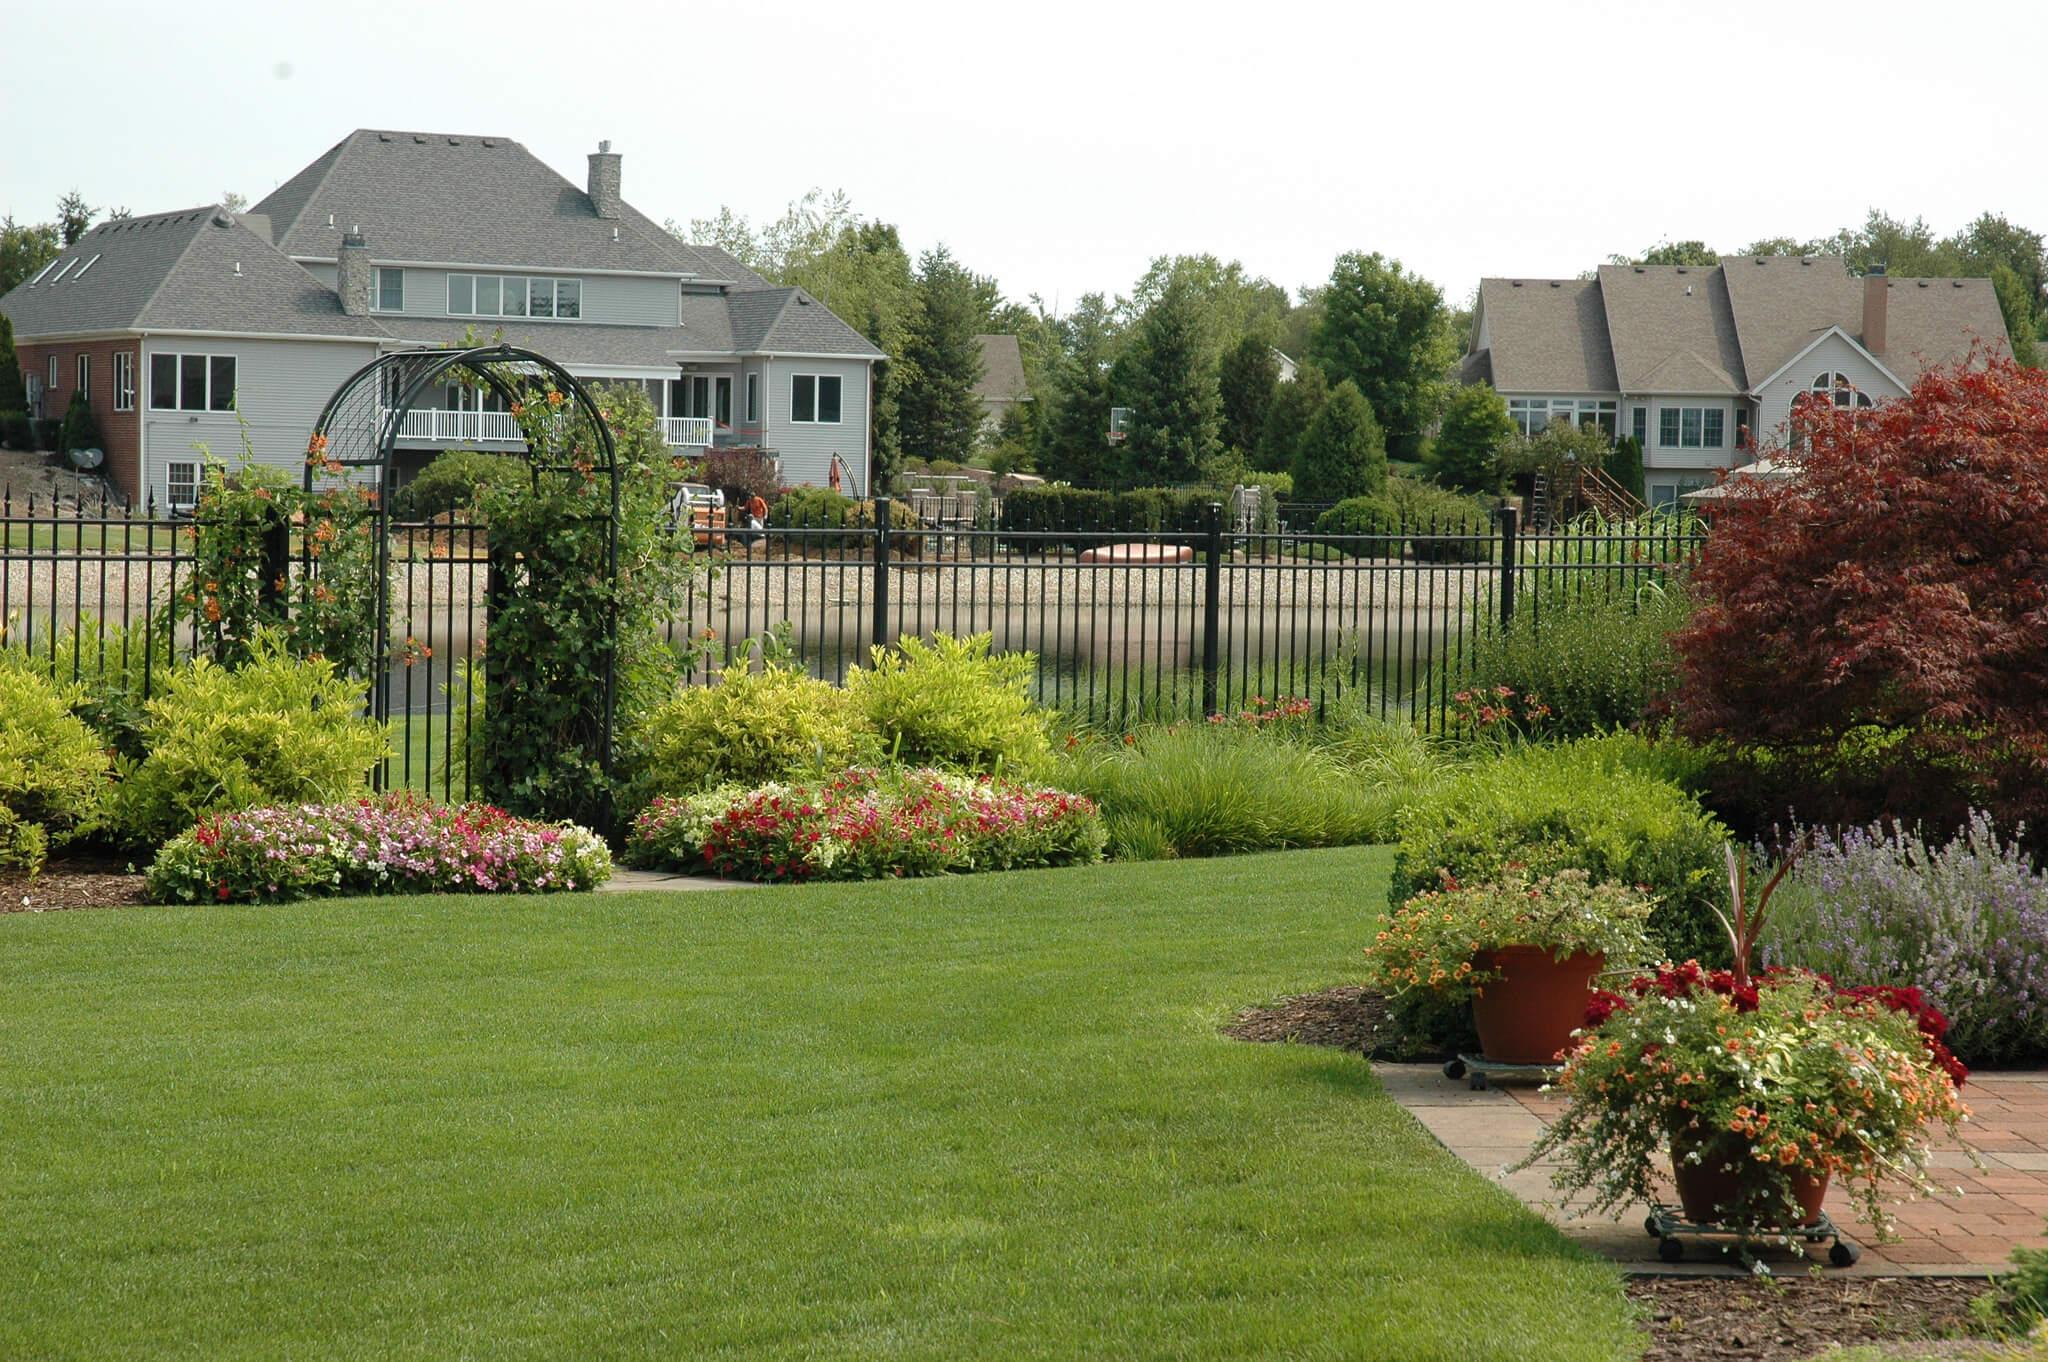 Foegley_Landscaping_Ornamental_and_Formal_Gardens6